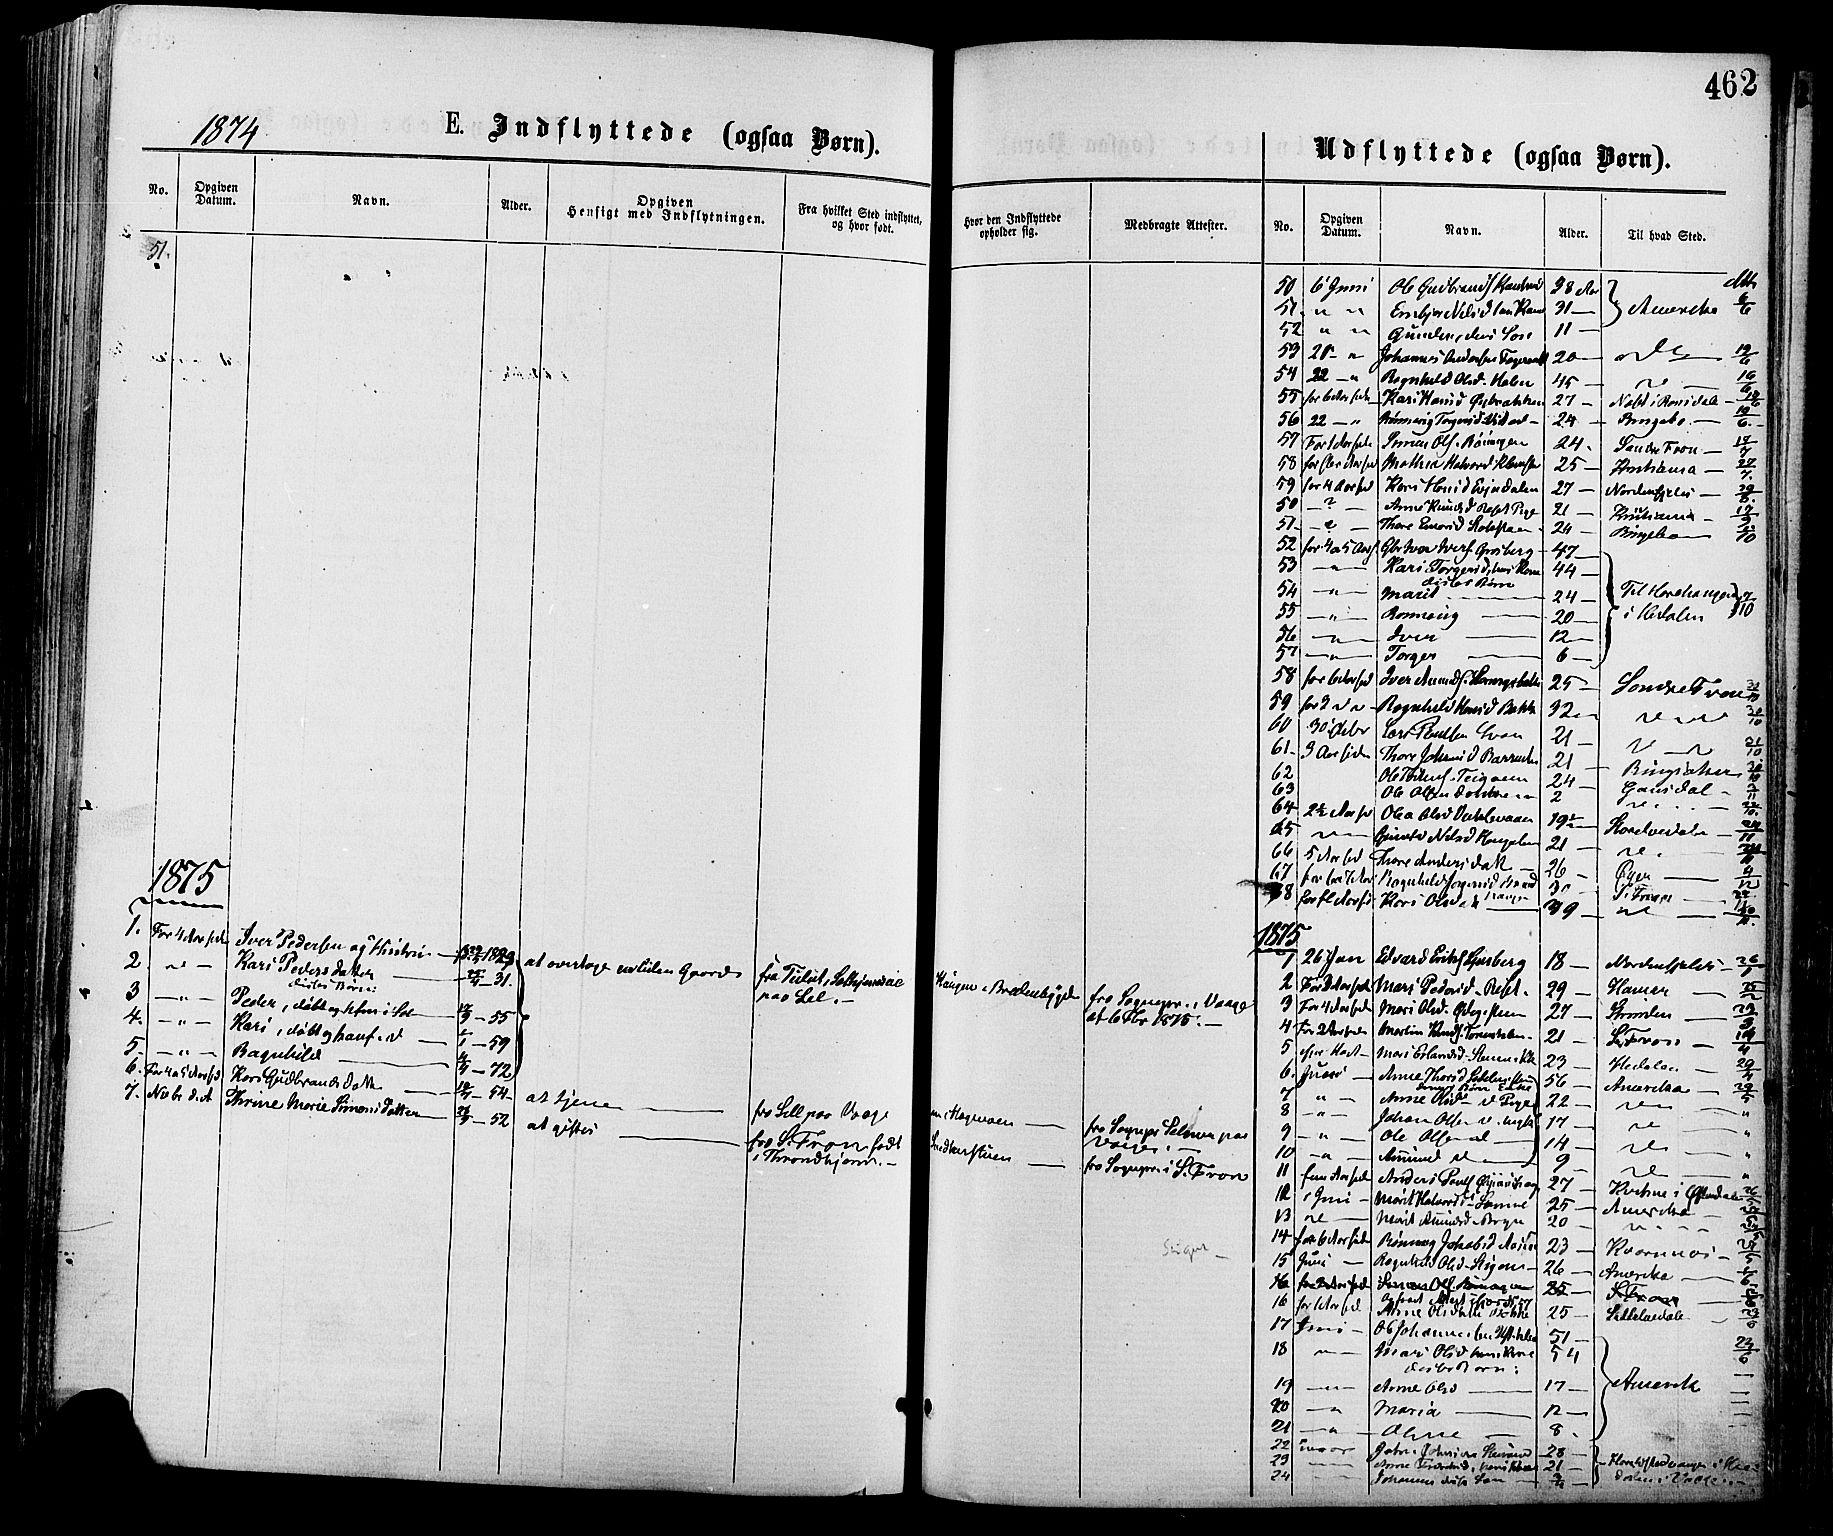 SAH, Nord-Fron prestekontor, Ministerialbok nr. 2, 1865-1883, s. 462